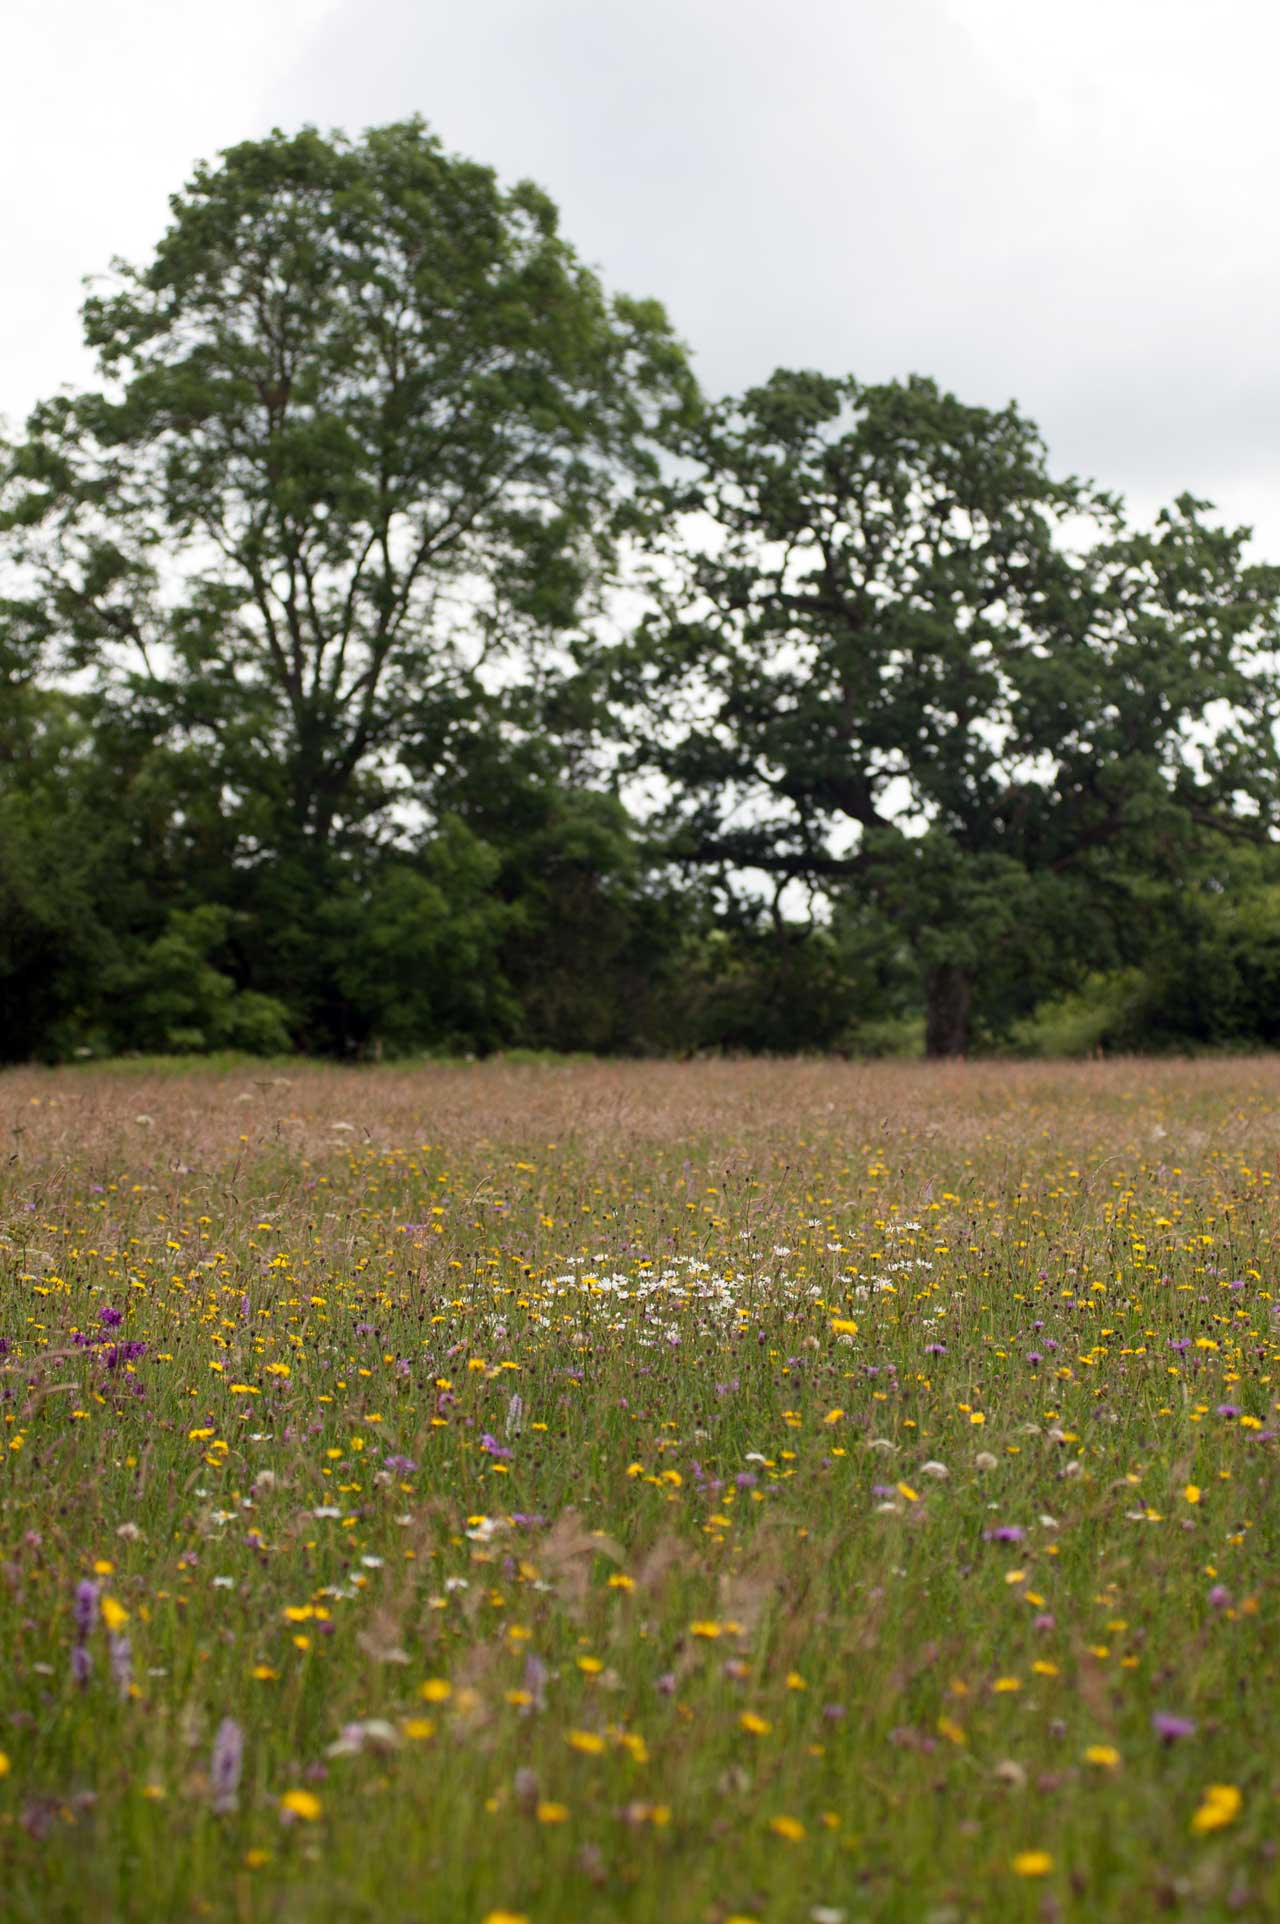 Photo: Ryewater Farm, Dorset